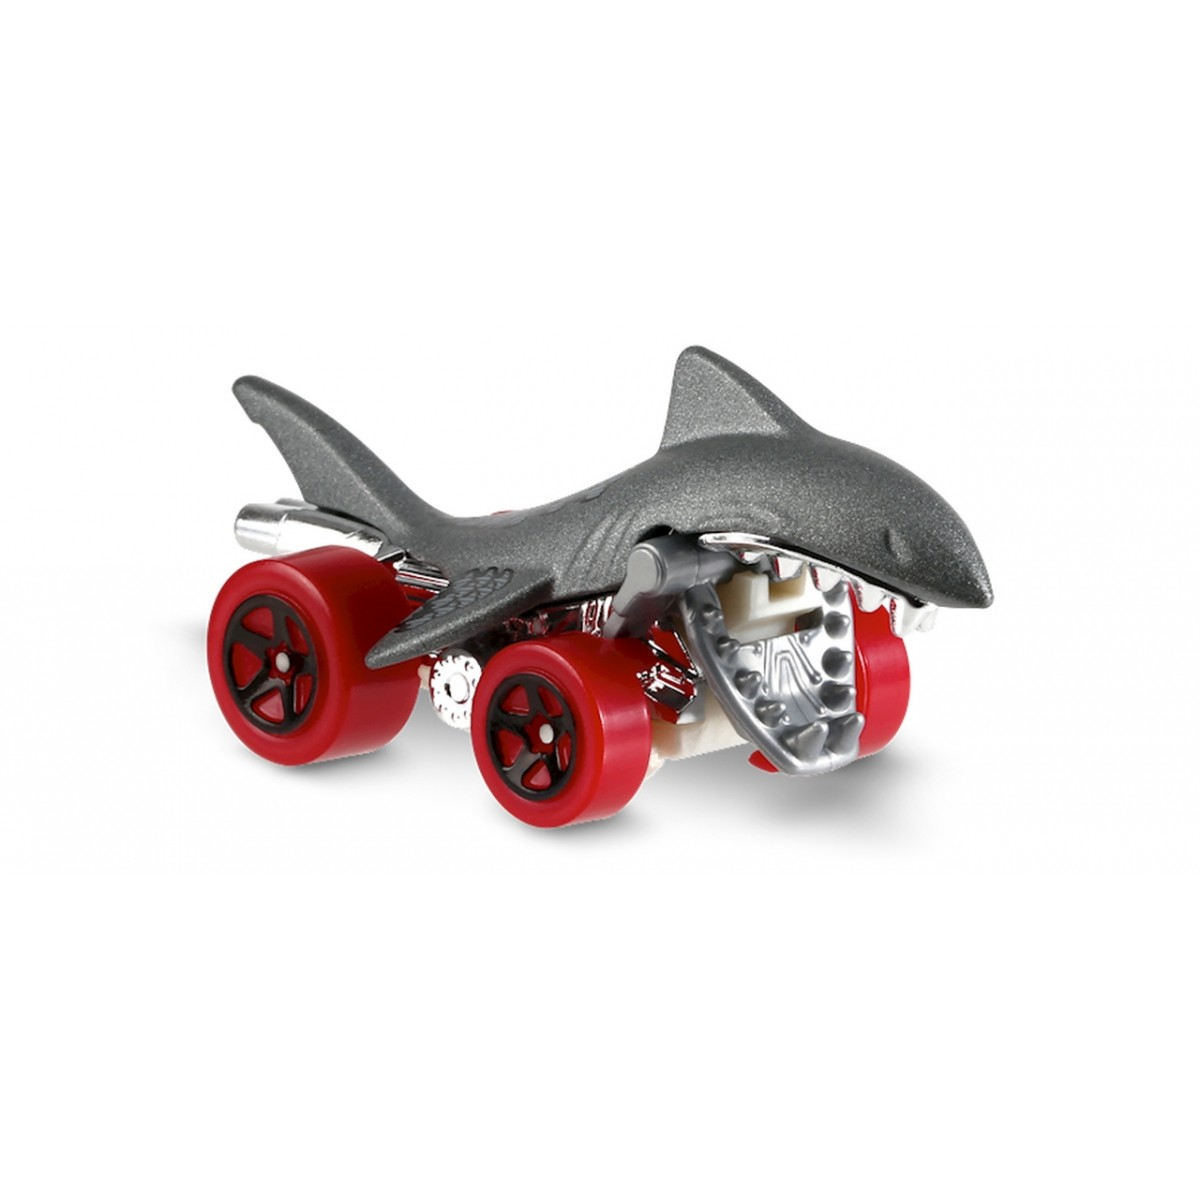 Carrinho Hot Wheels: Shark Bite Prateado